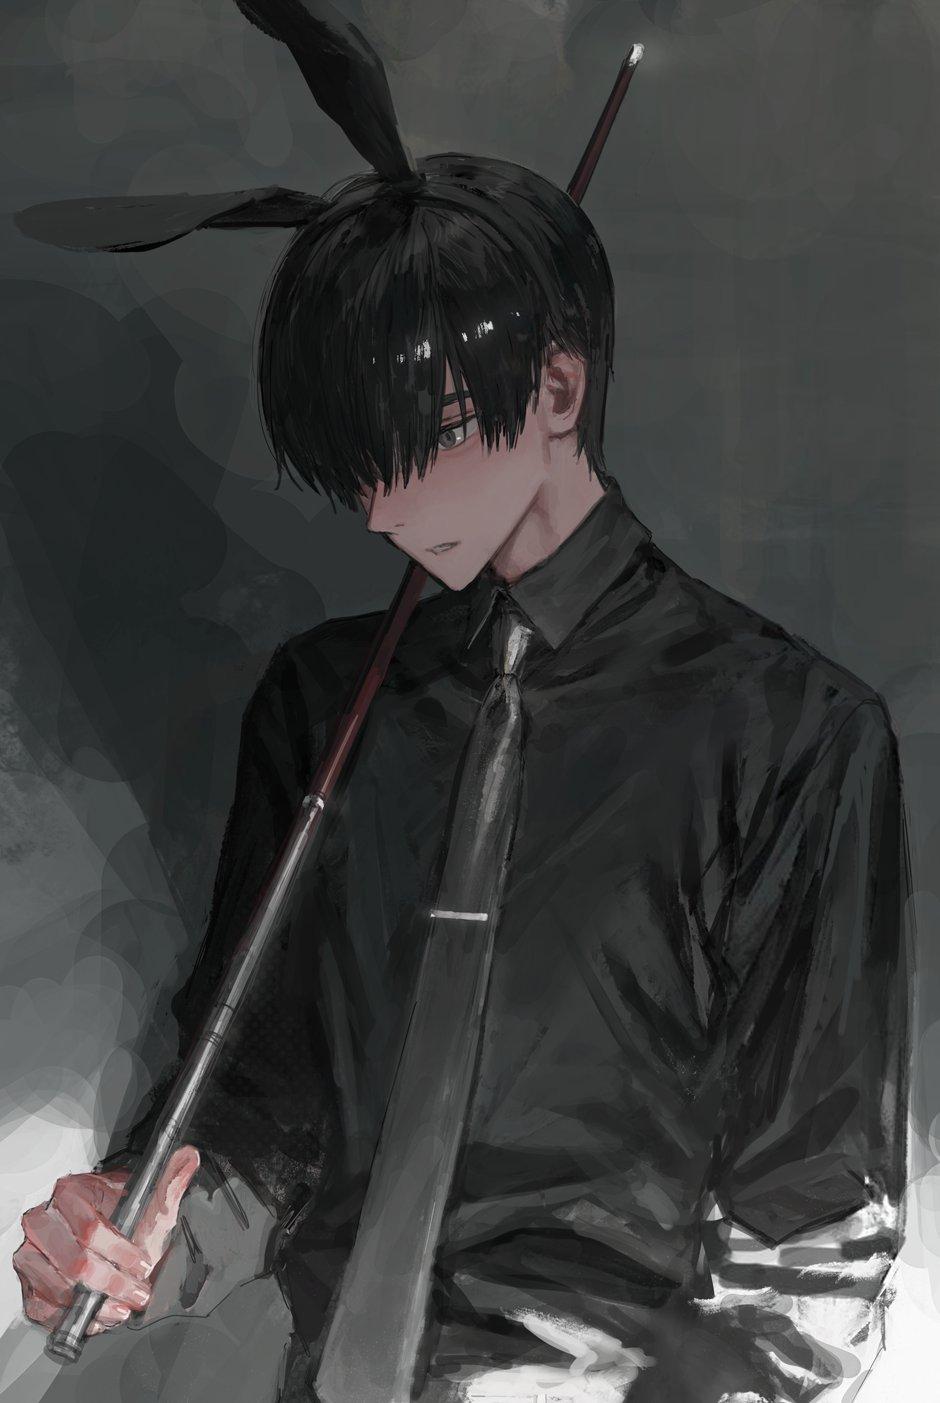 Raid On Twitter In 2020 Anime Drawings Boy Cool Anime Guys Dark Anime Guys